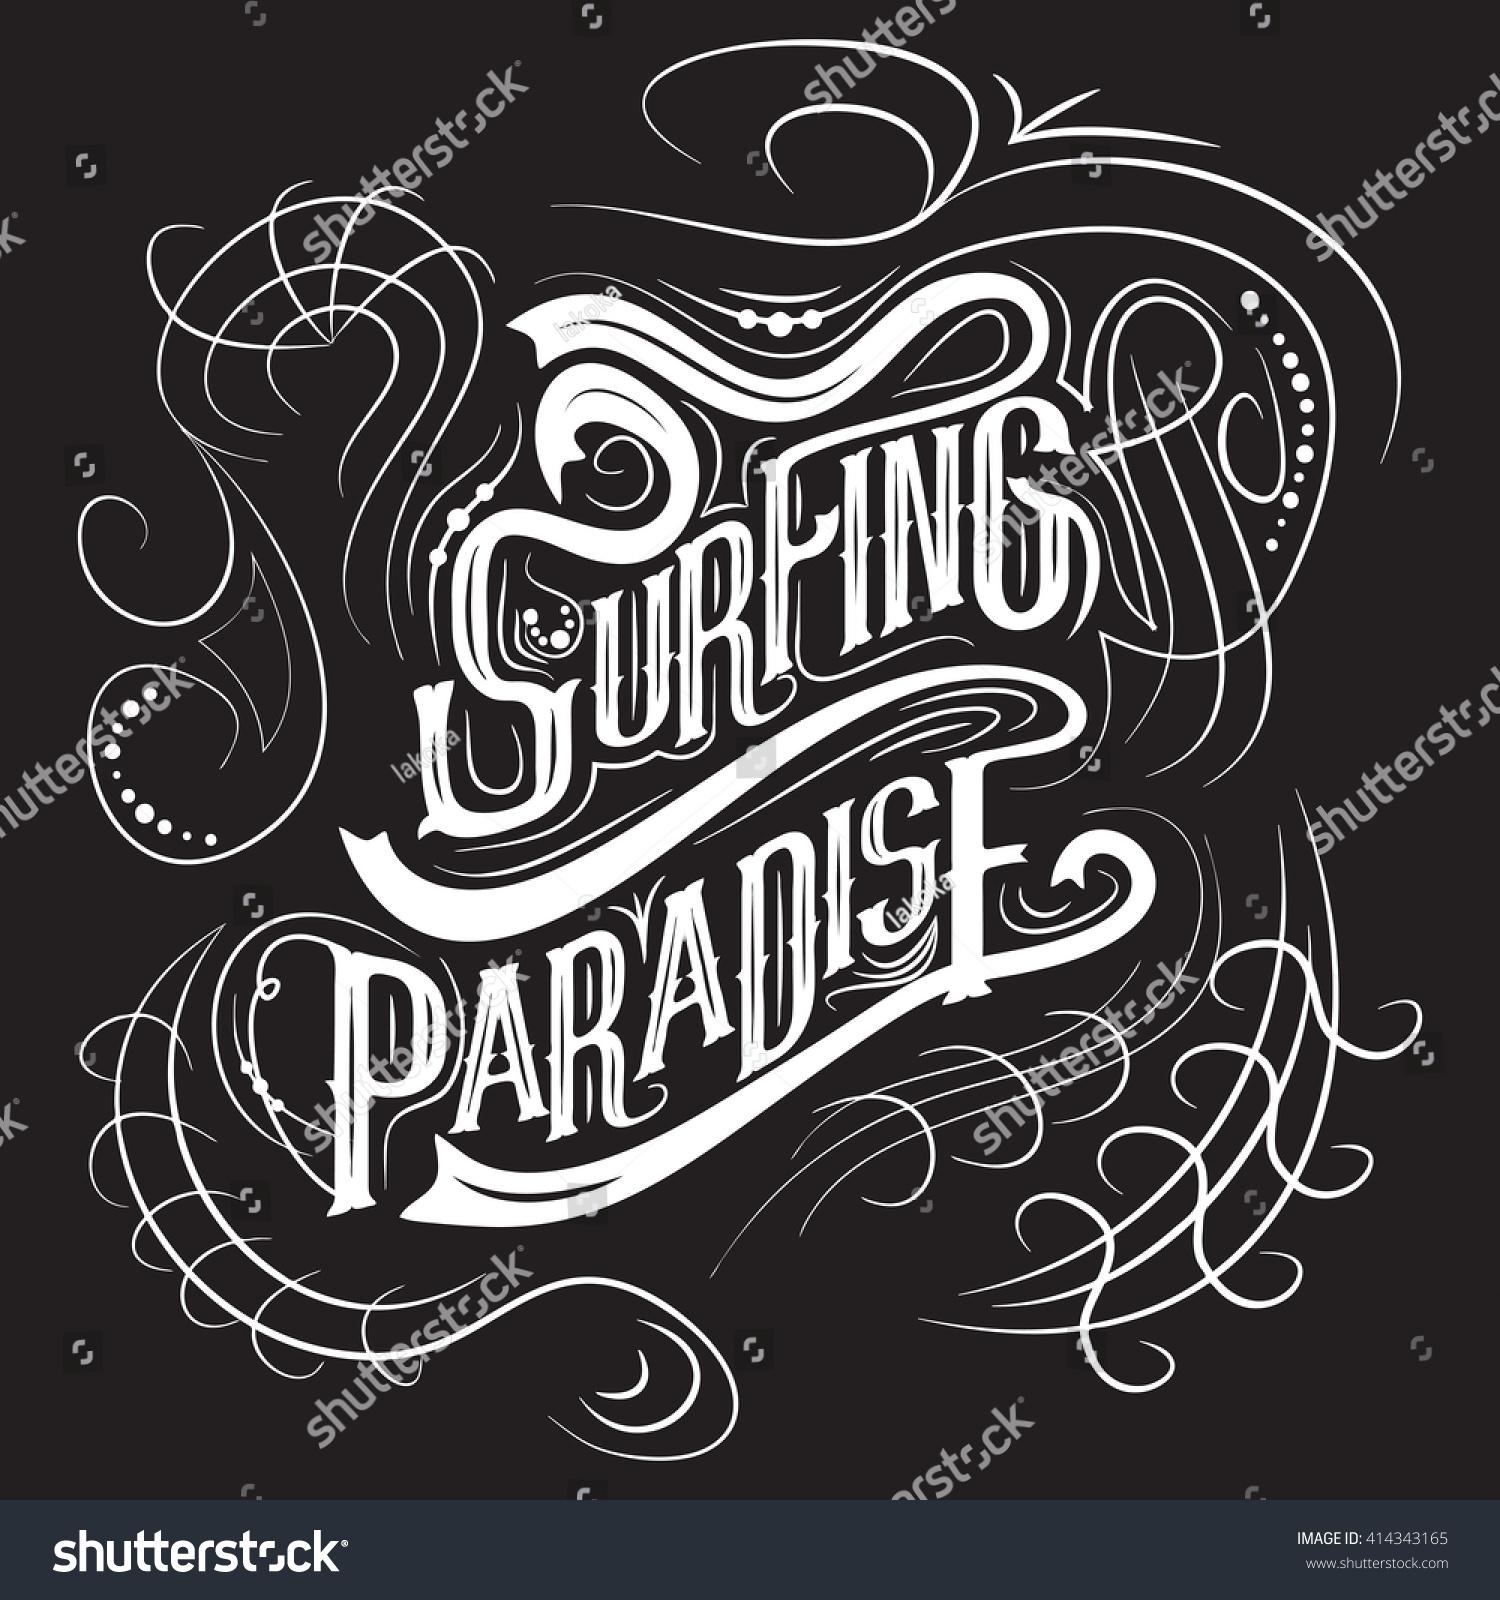 Design t shirt artwork - Surfing T Shirt Graphic Design Artwork Apparel Stamp Typography Emblem Creative Design